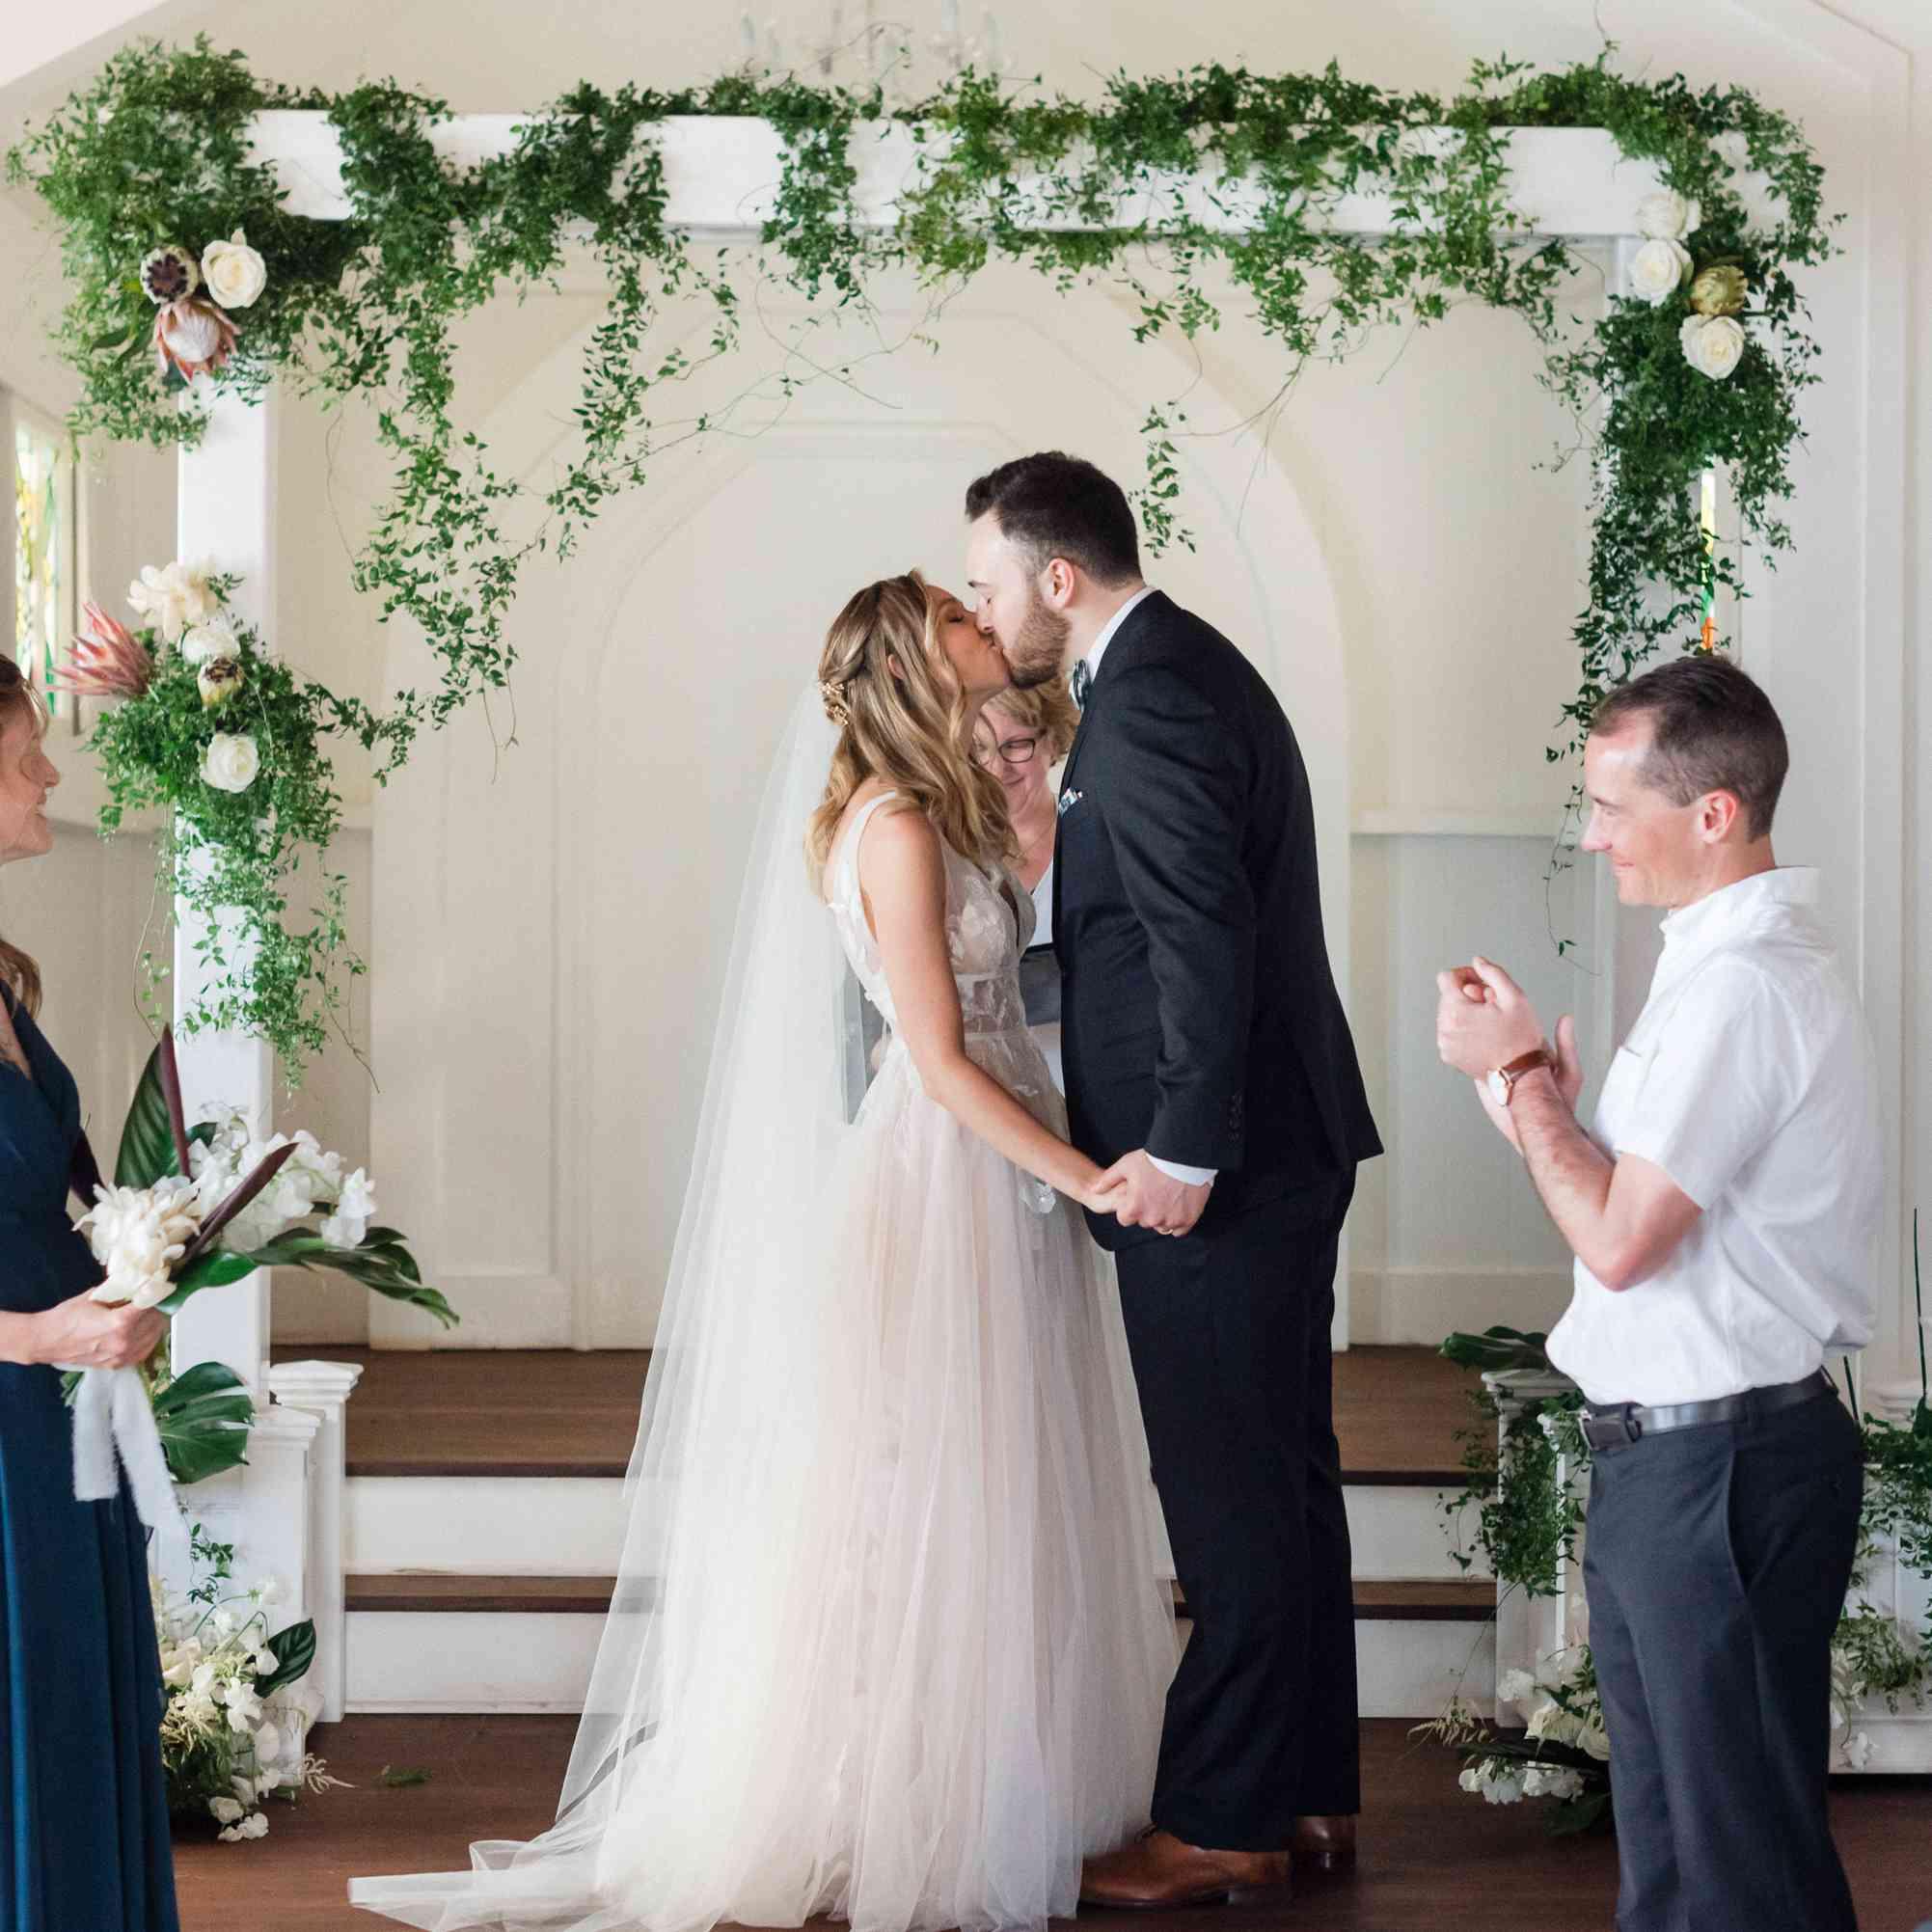 tropical maui wedding, bride and groom kissing ceremony